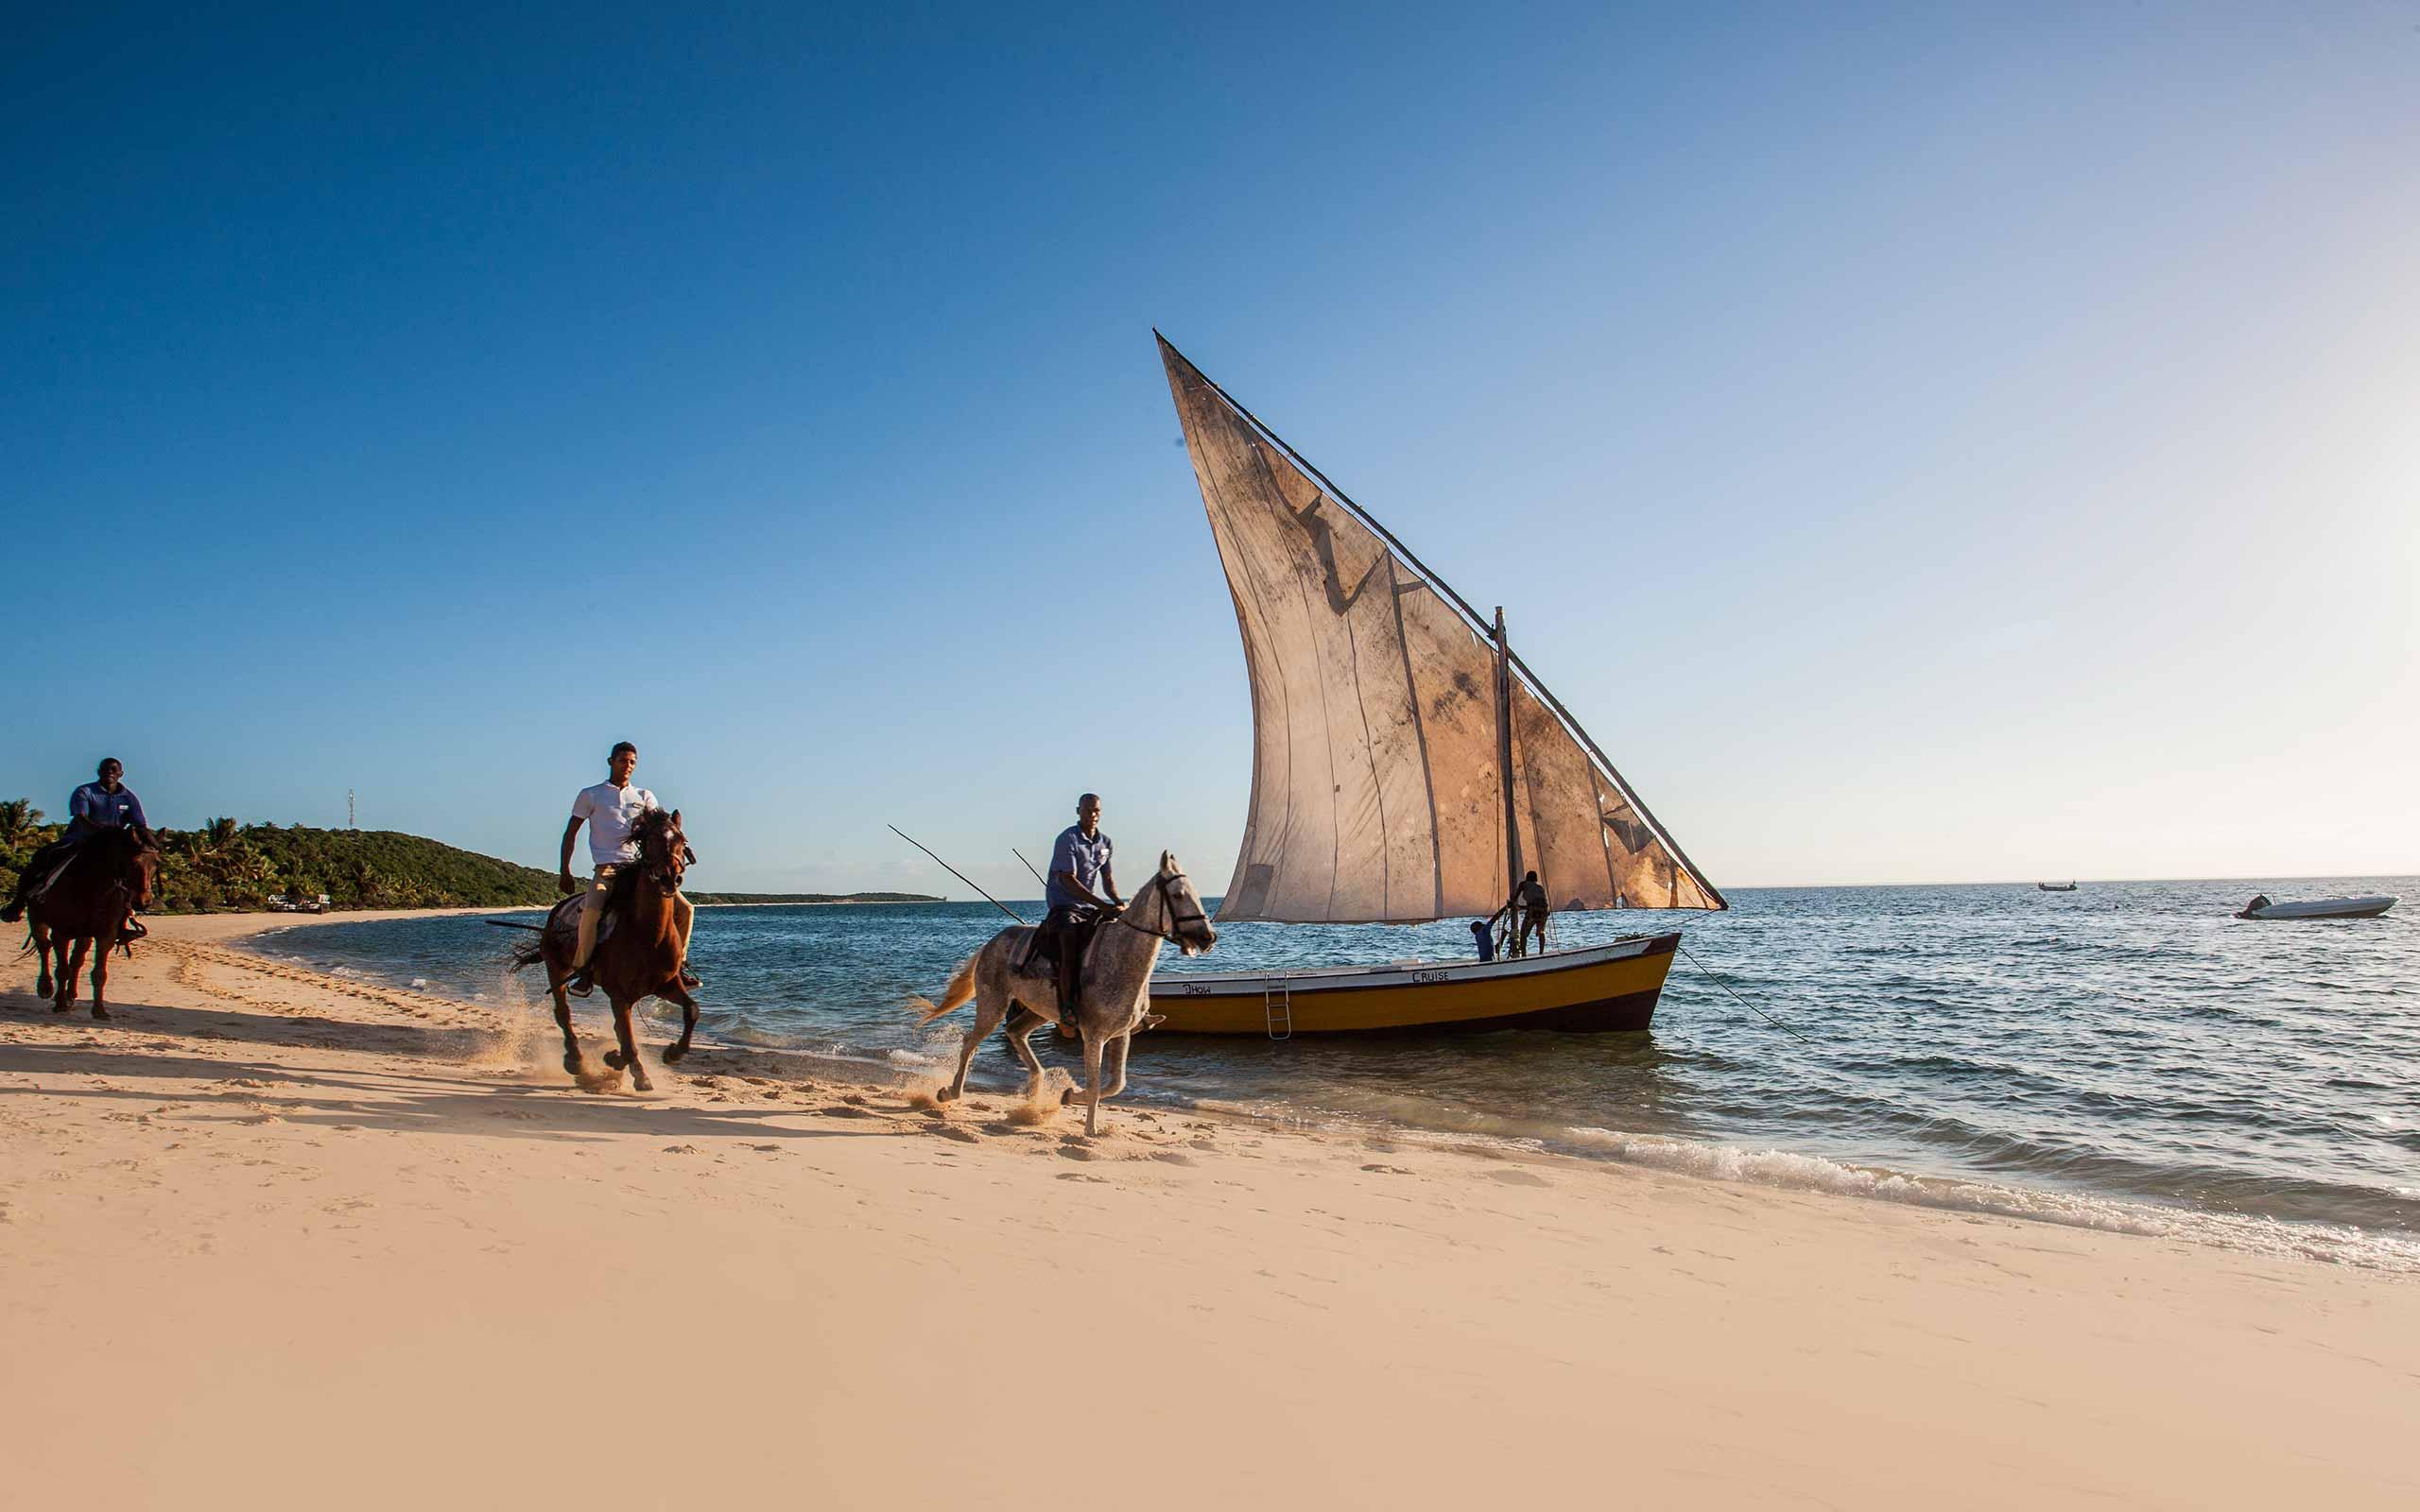 enkosi-africa-safari-mozambique-bazaruto-anantara-island-dhow-horse-riding